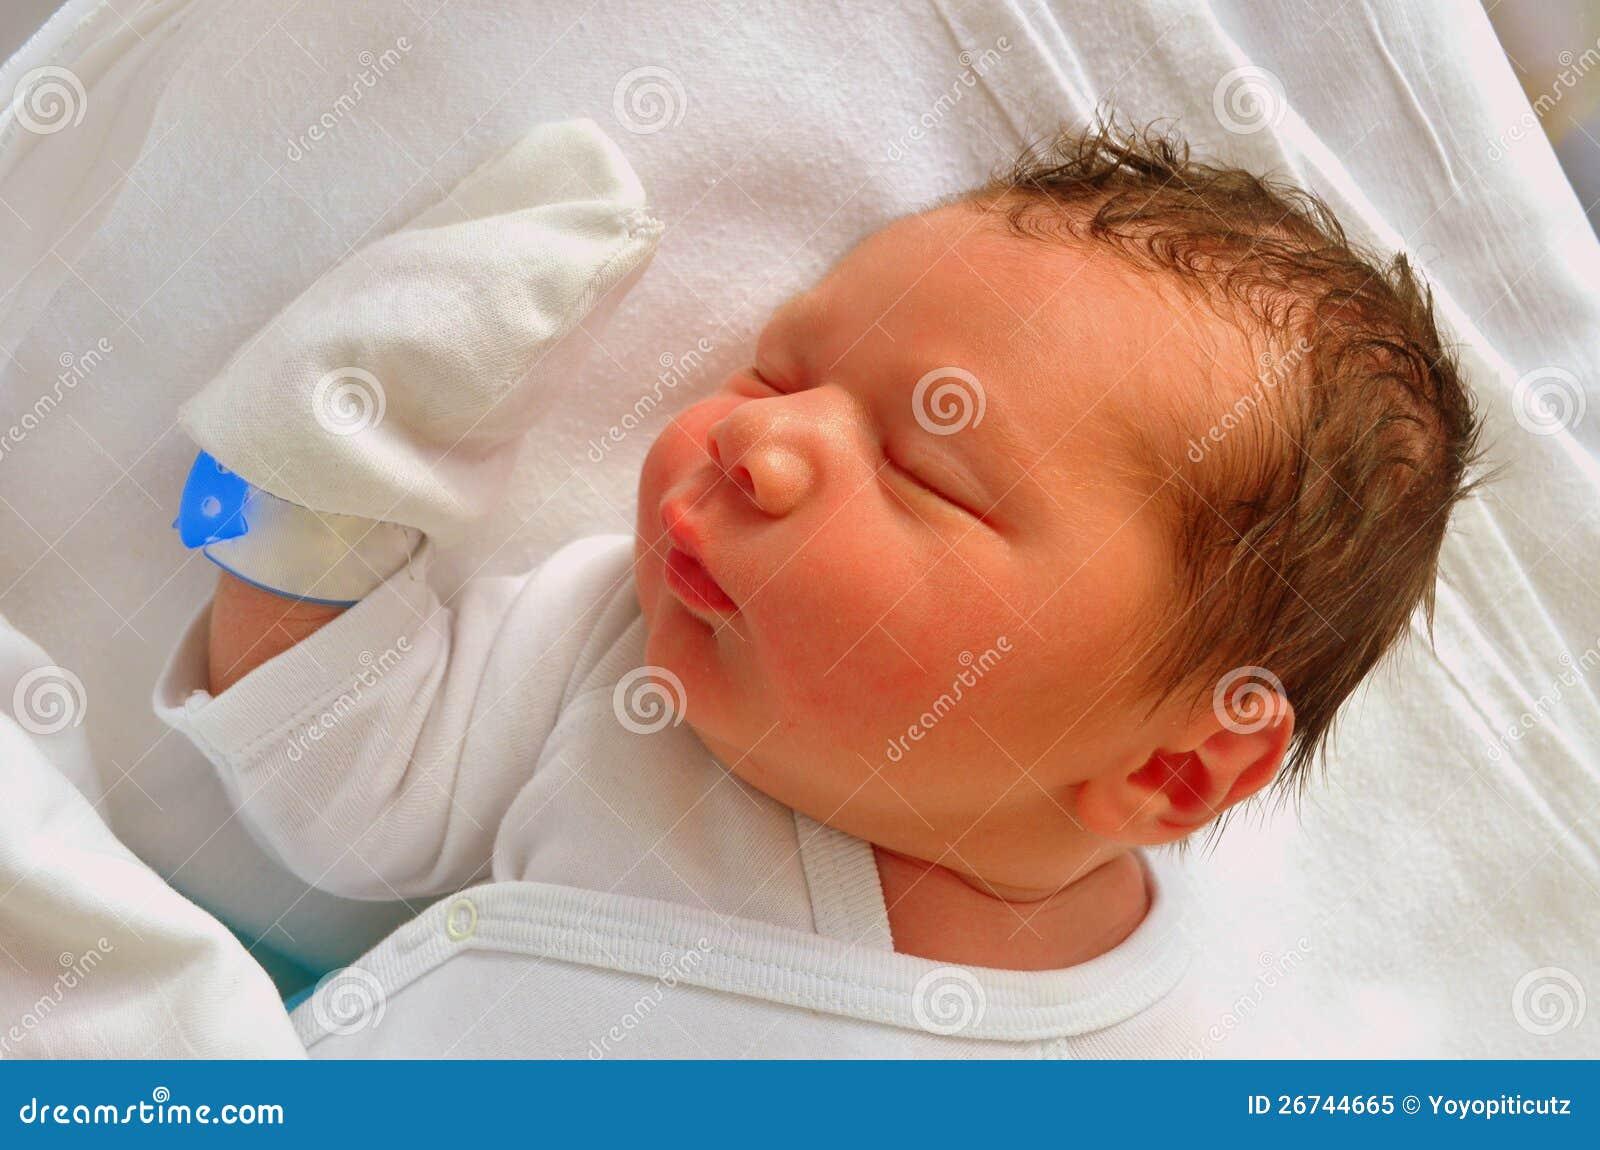 New Born Baby Boy Cloth